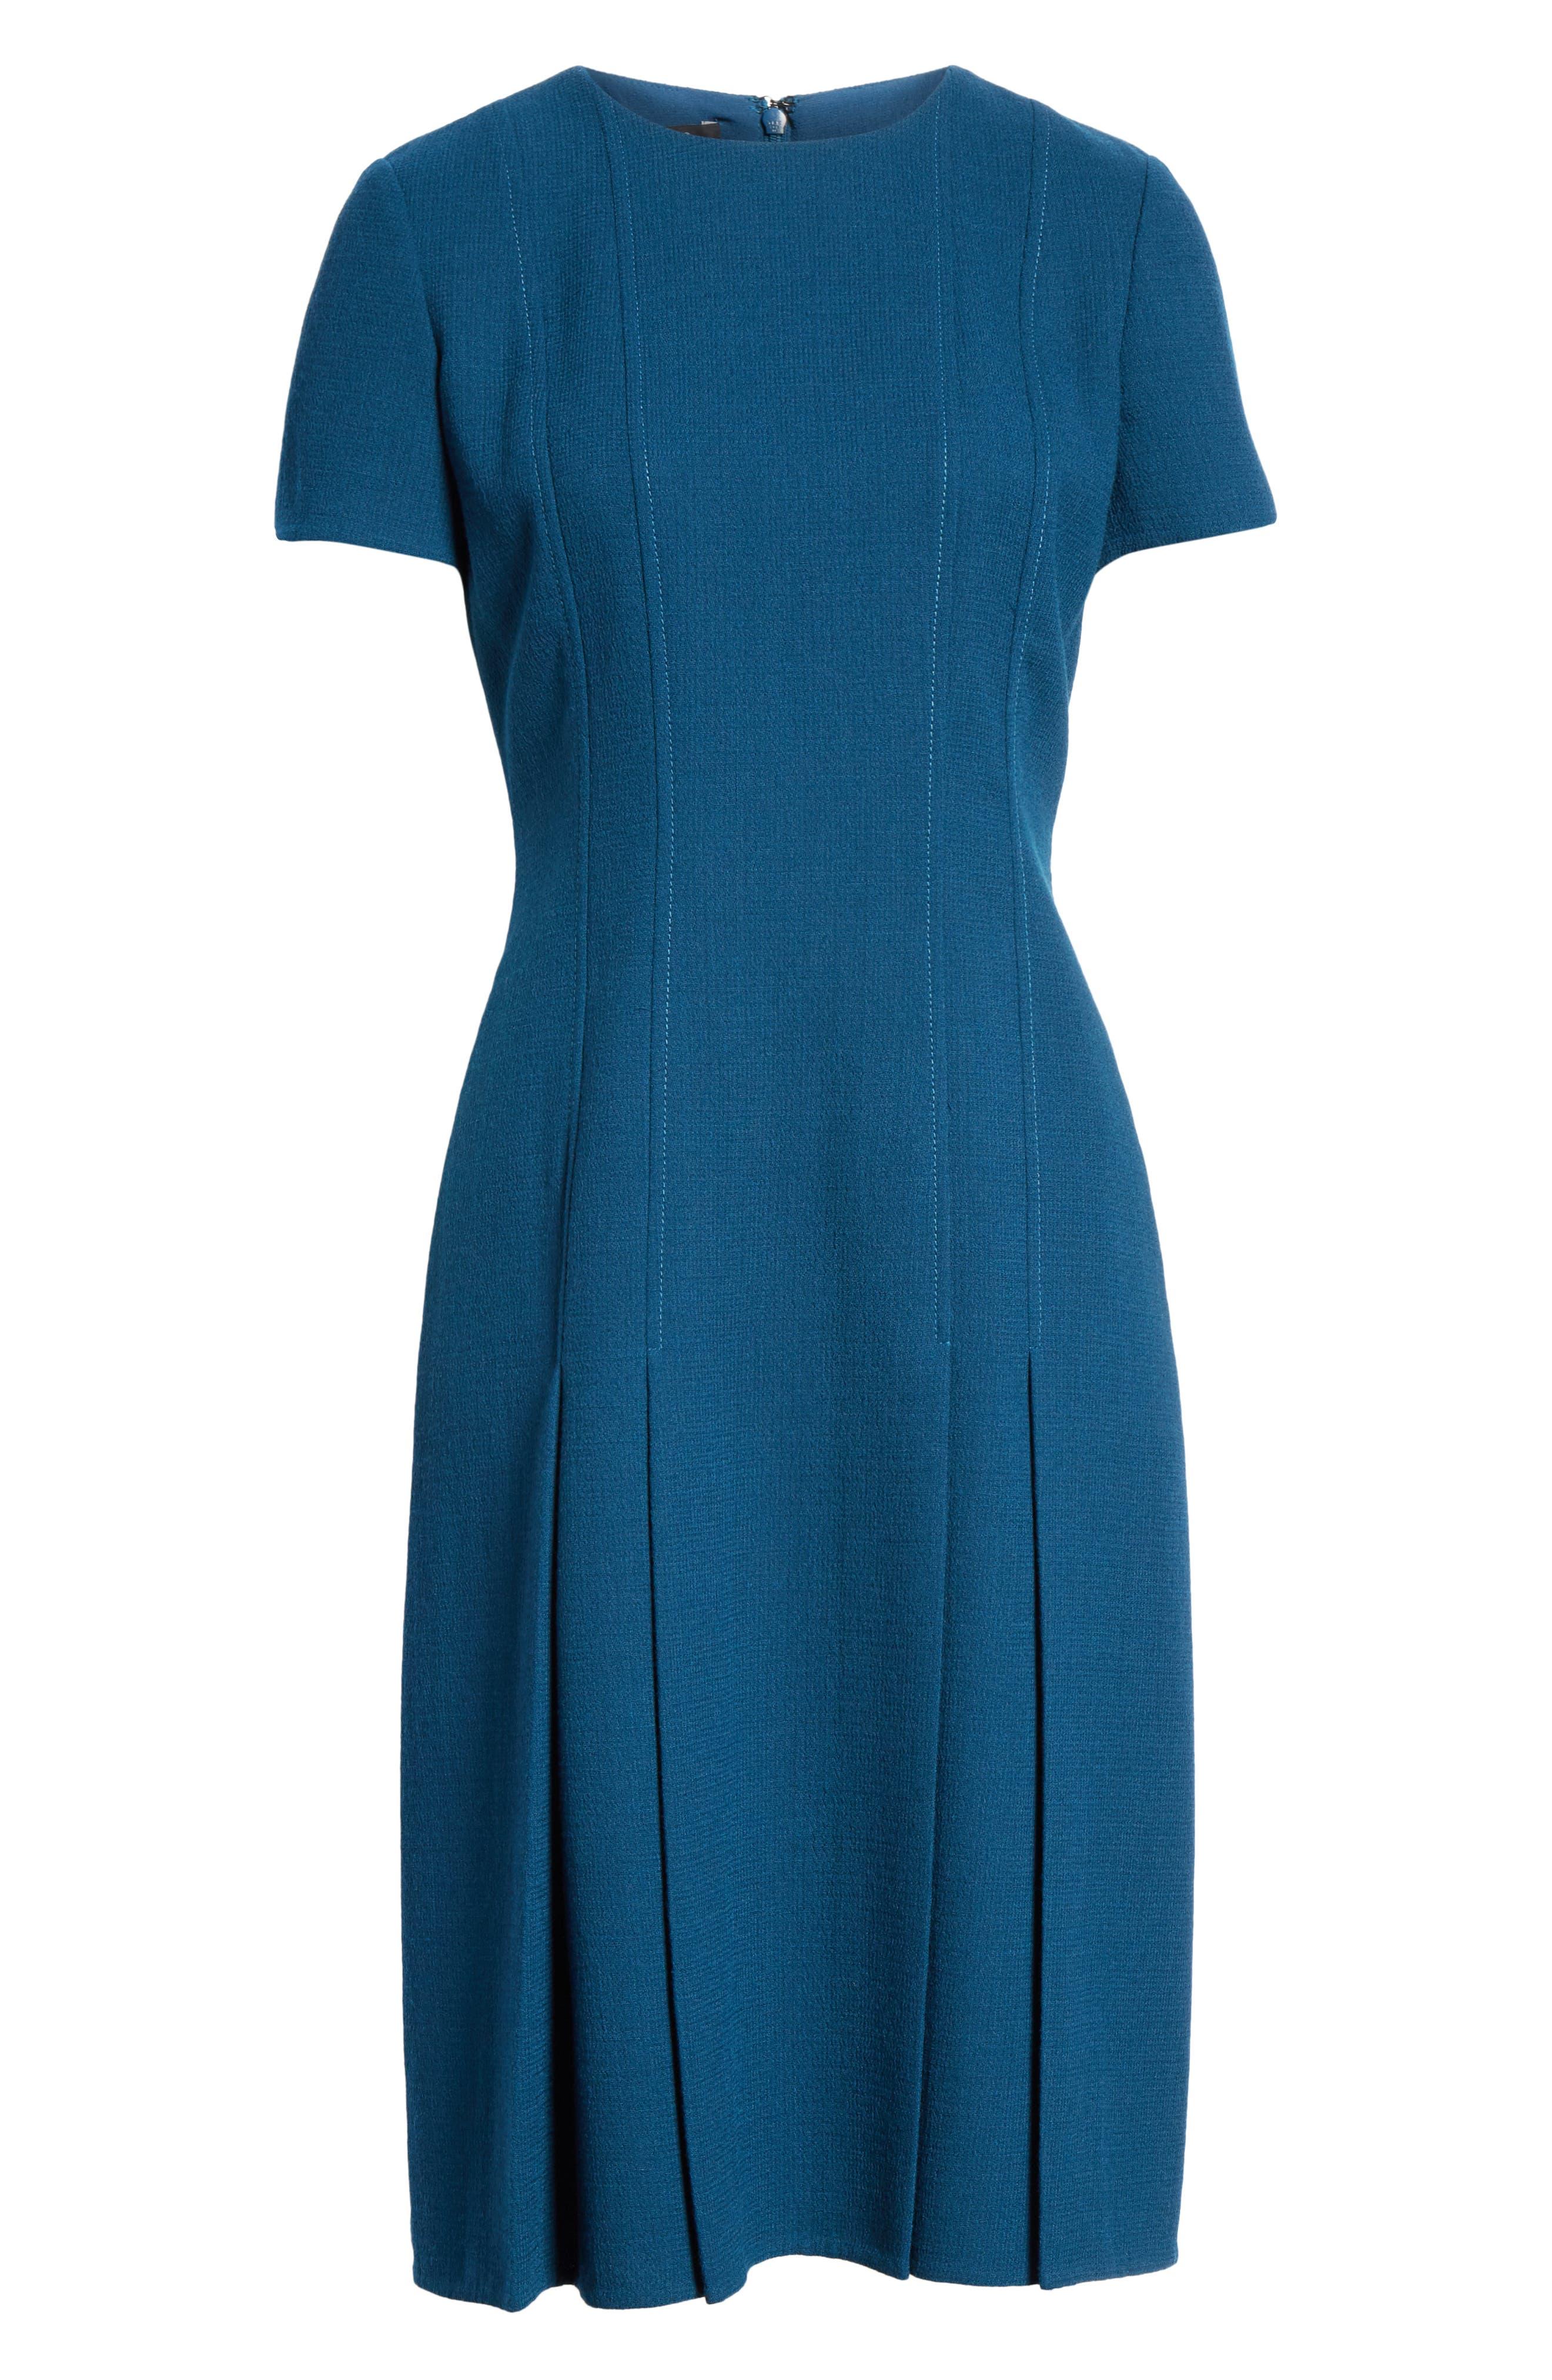 Jannie Pleated Hem Dress,                             Alternate thumbnail 7, color,                             EMPRESS TEAL